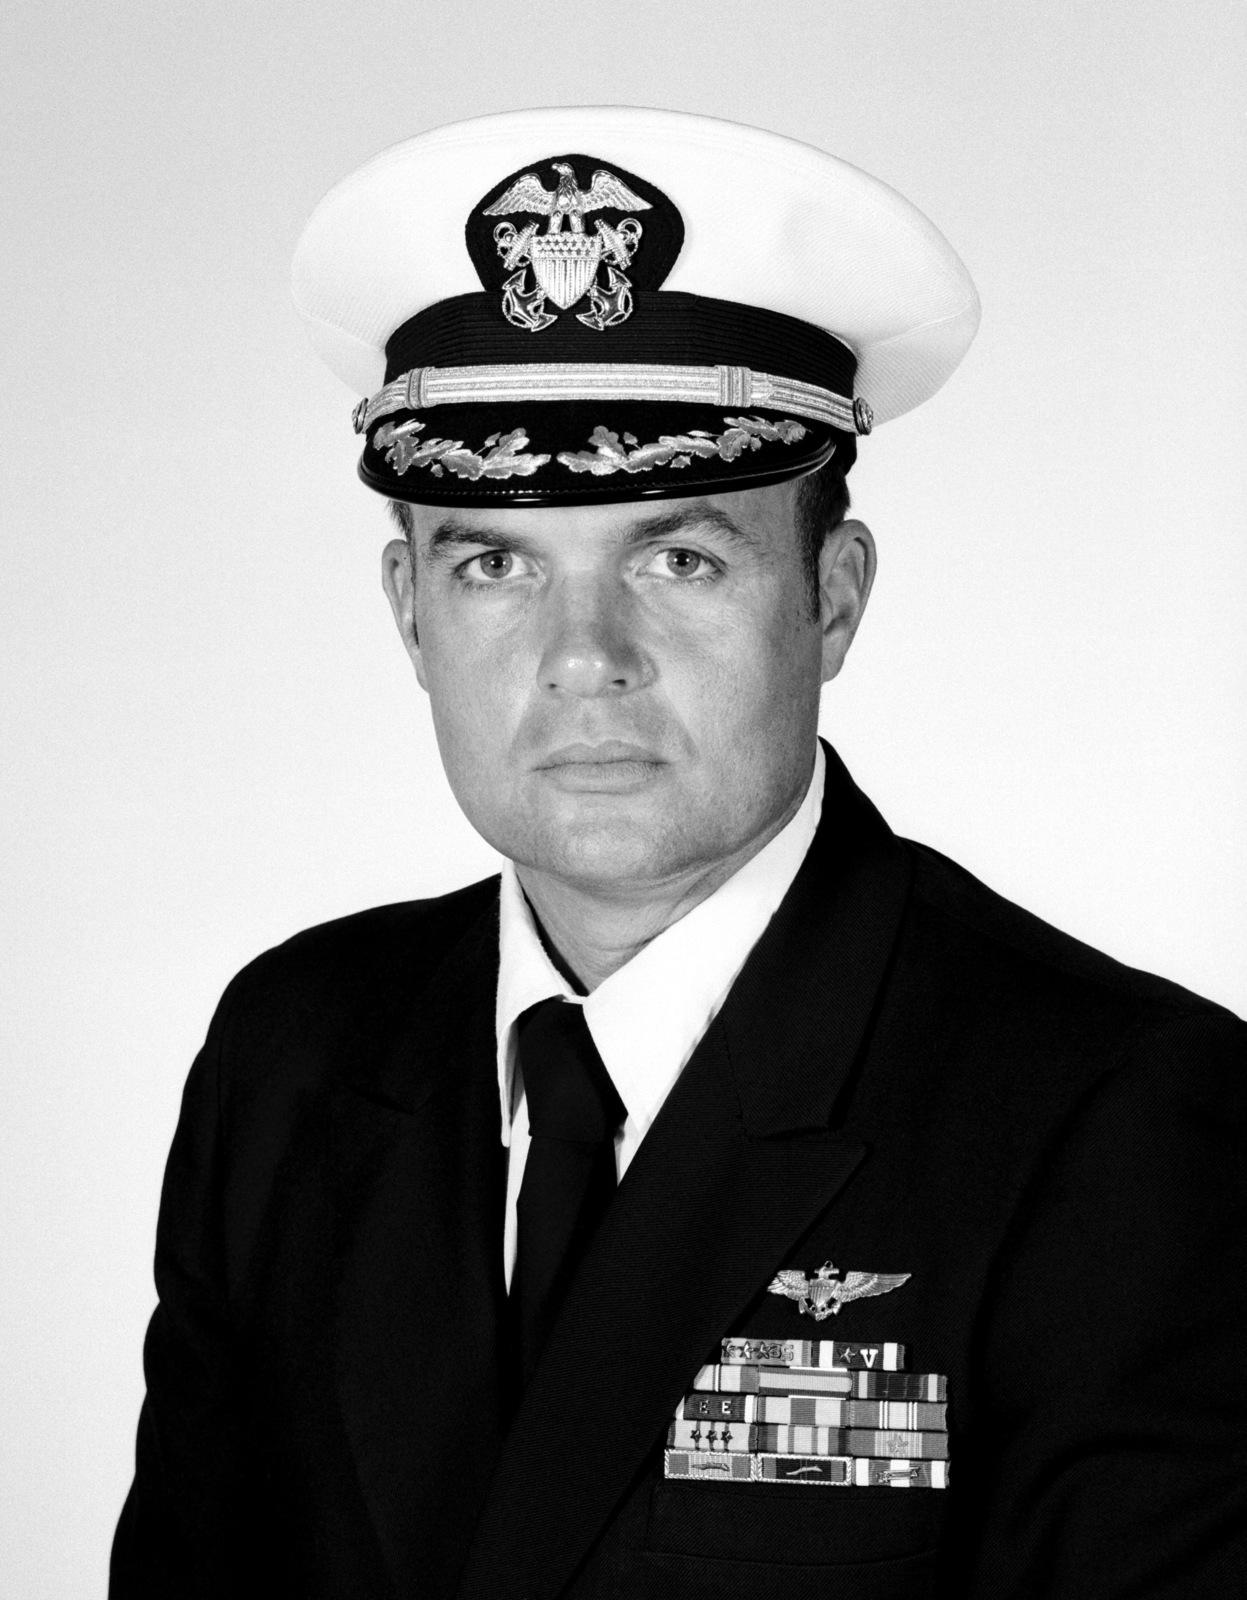 CDR Hugh J. McCullom, USN (covered)